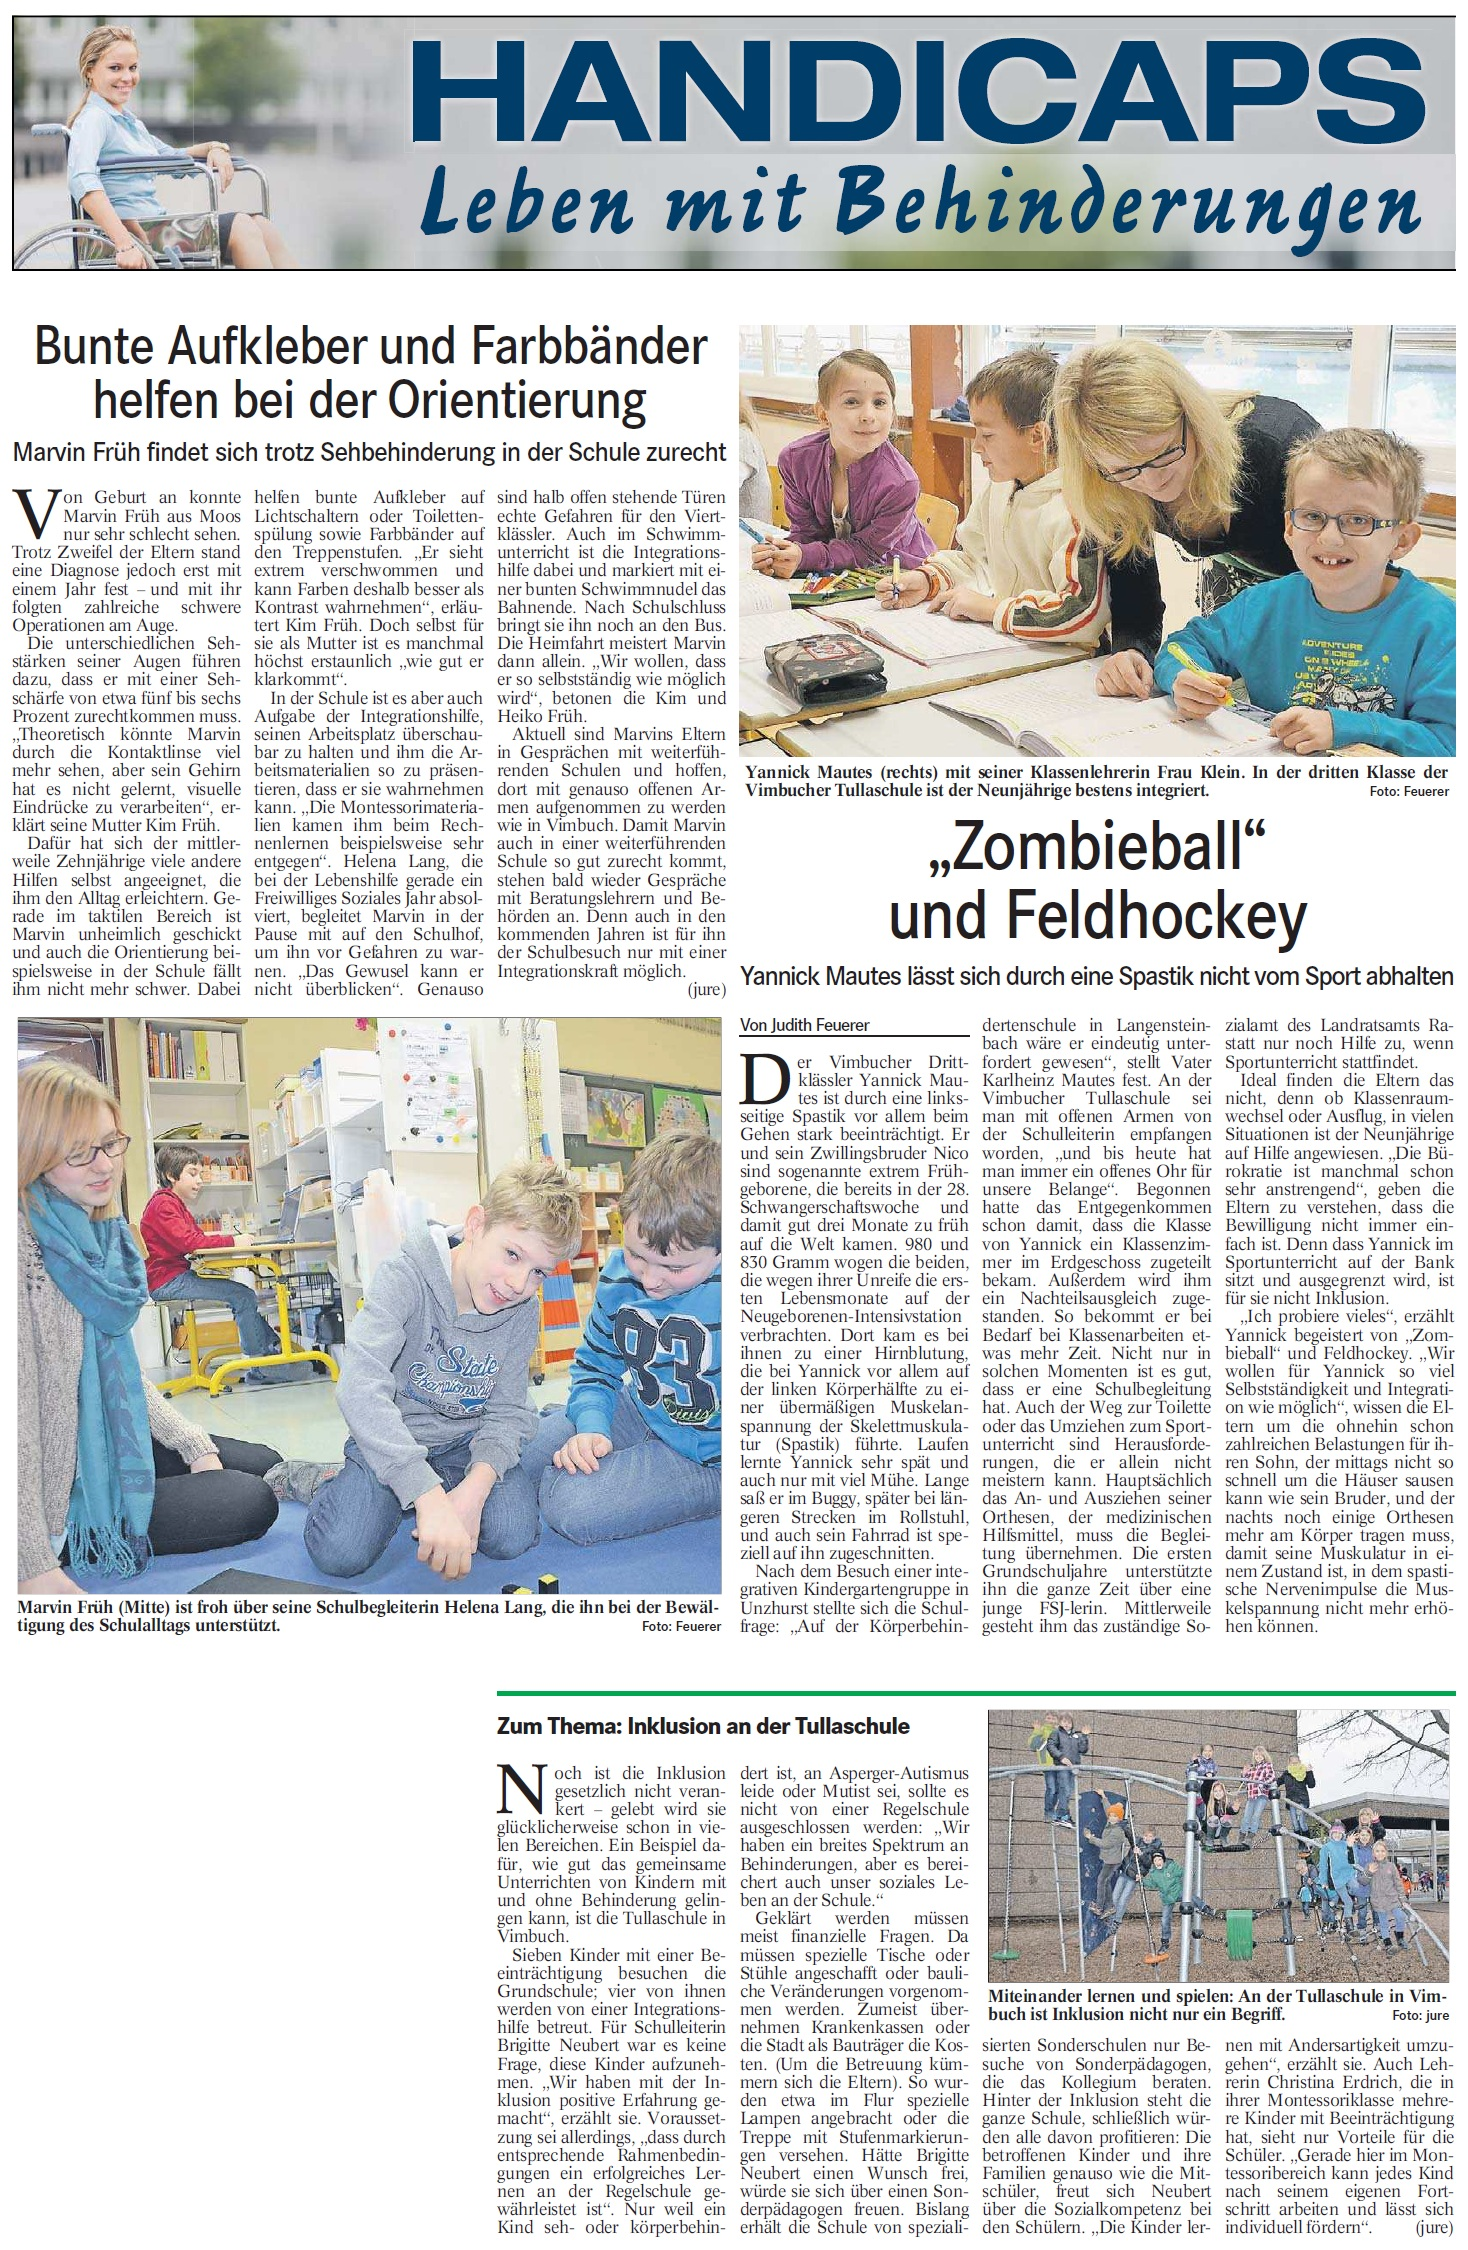 Badisches Tagblatt, 22.01.2014: Handicaps